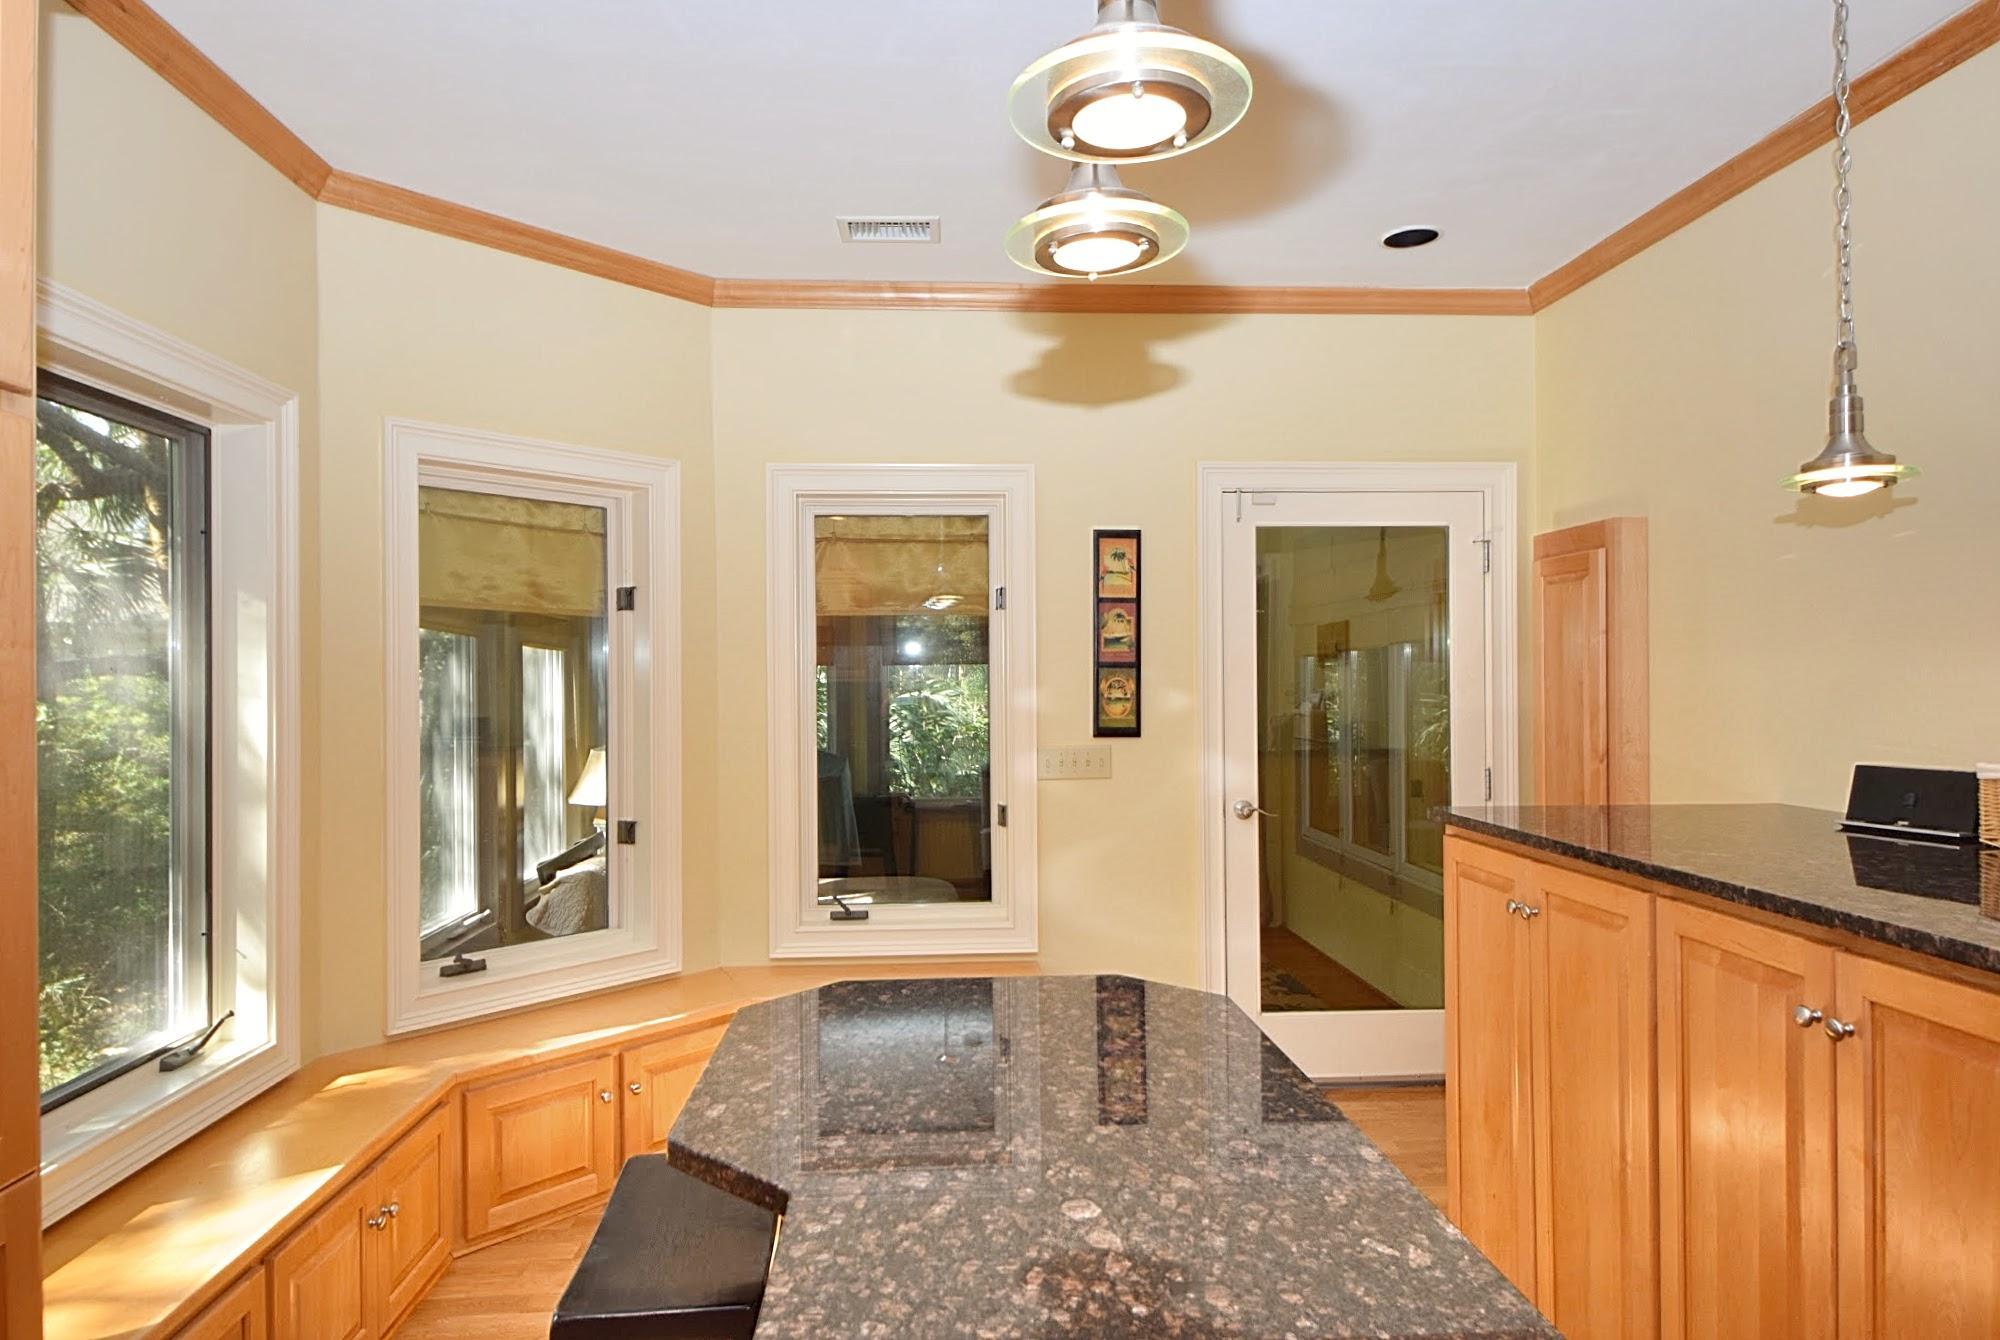 Kiawah Island Homes For Sale - 132 Governors, Kiawah Island, SC - 2